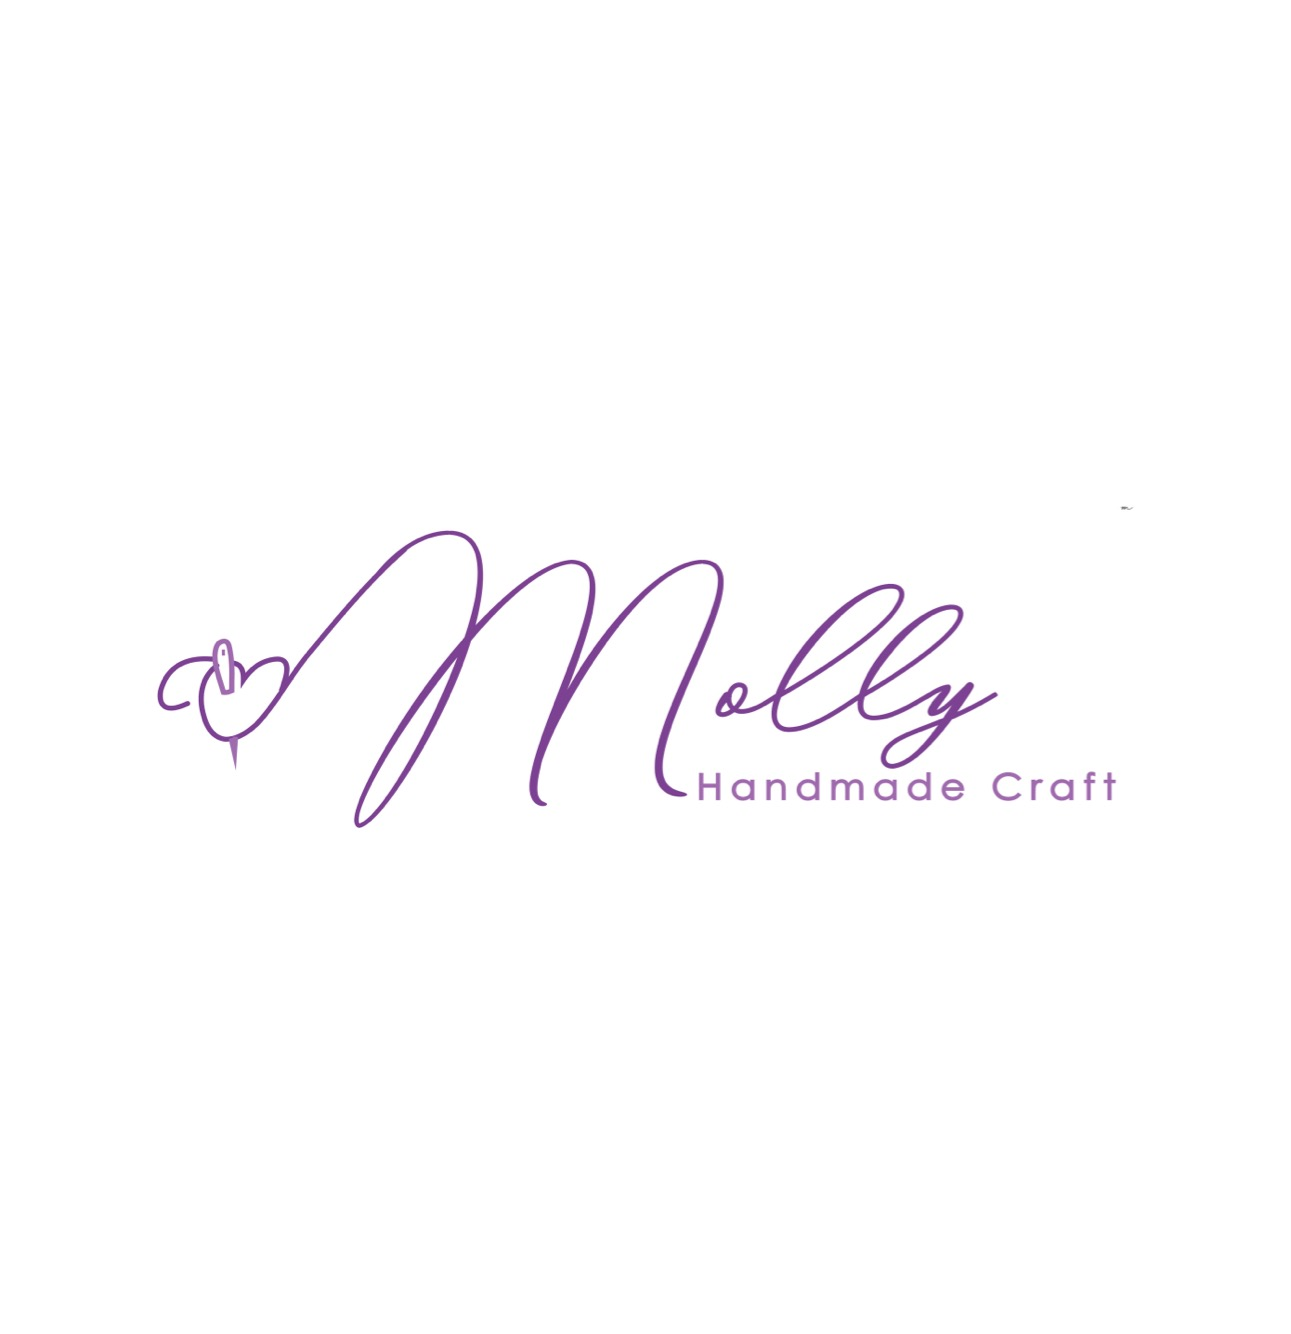 Molly Handmade Craft